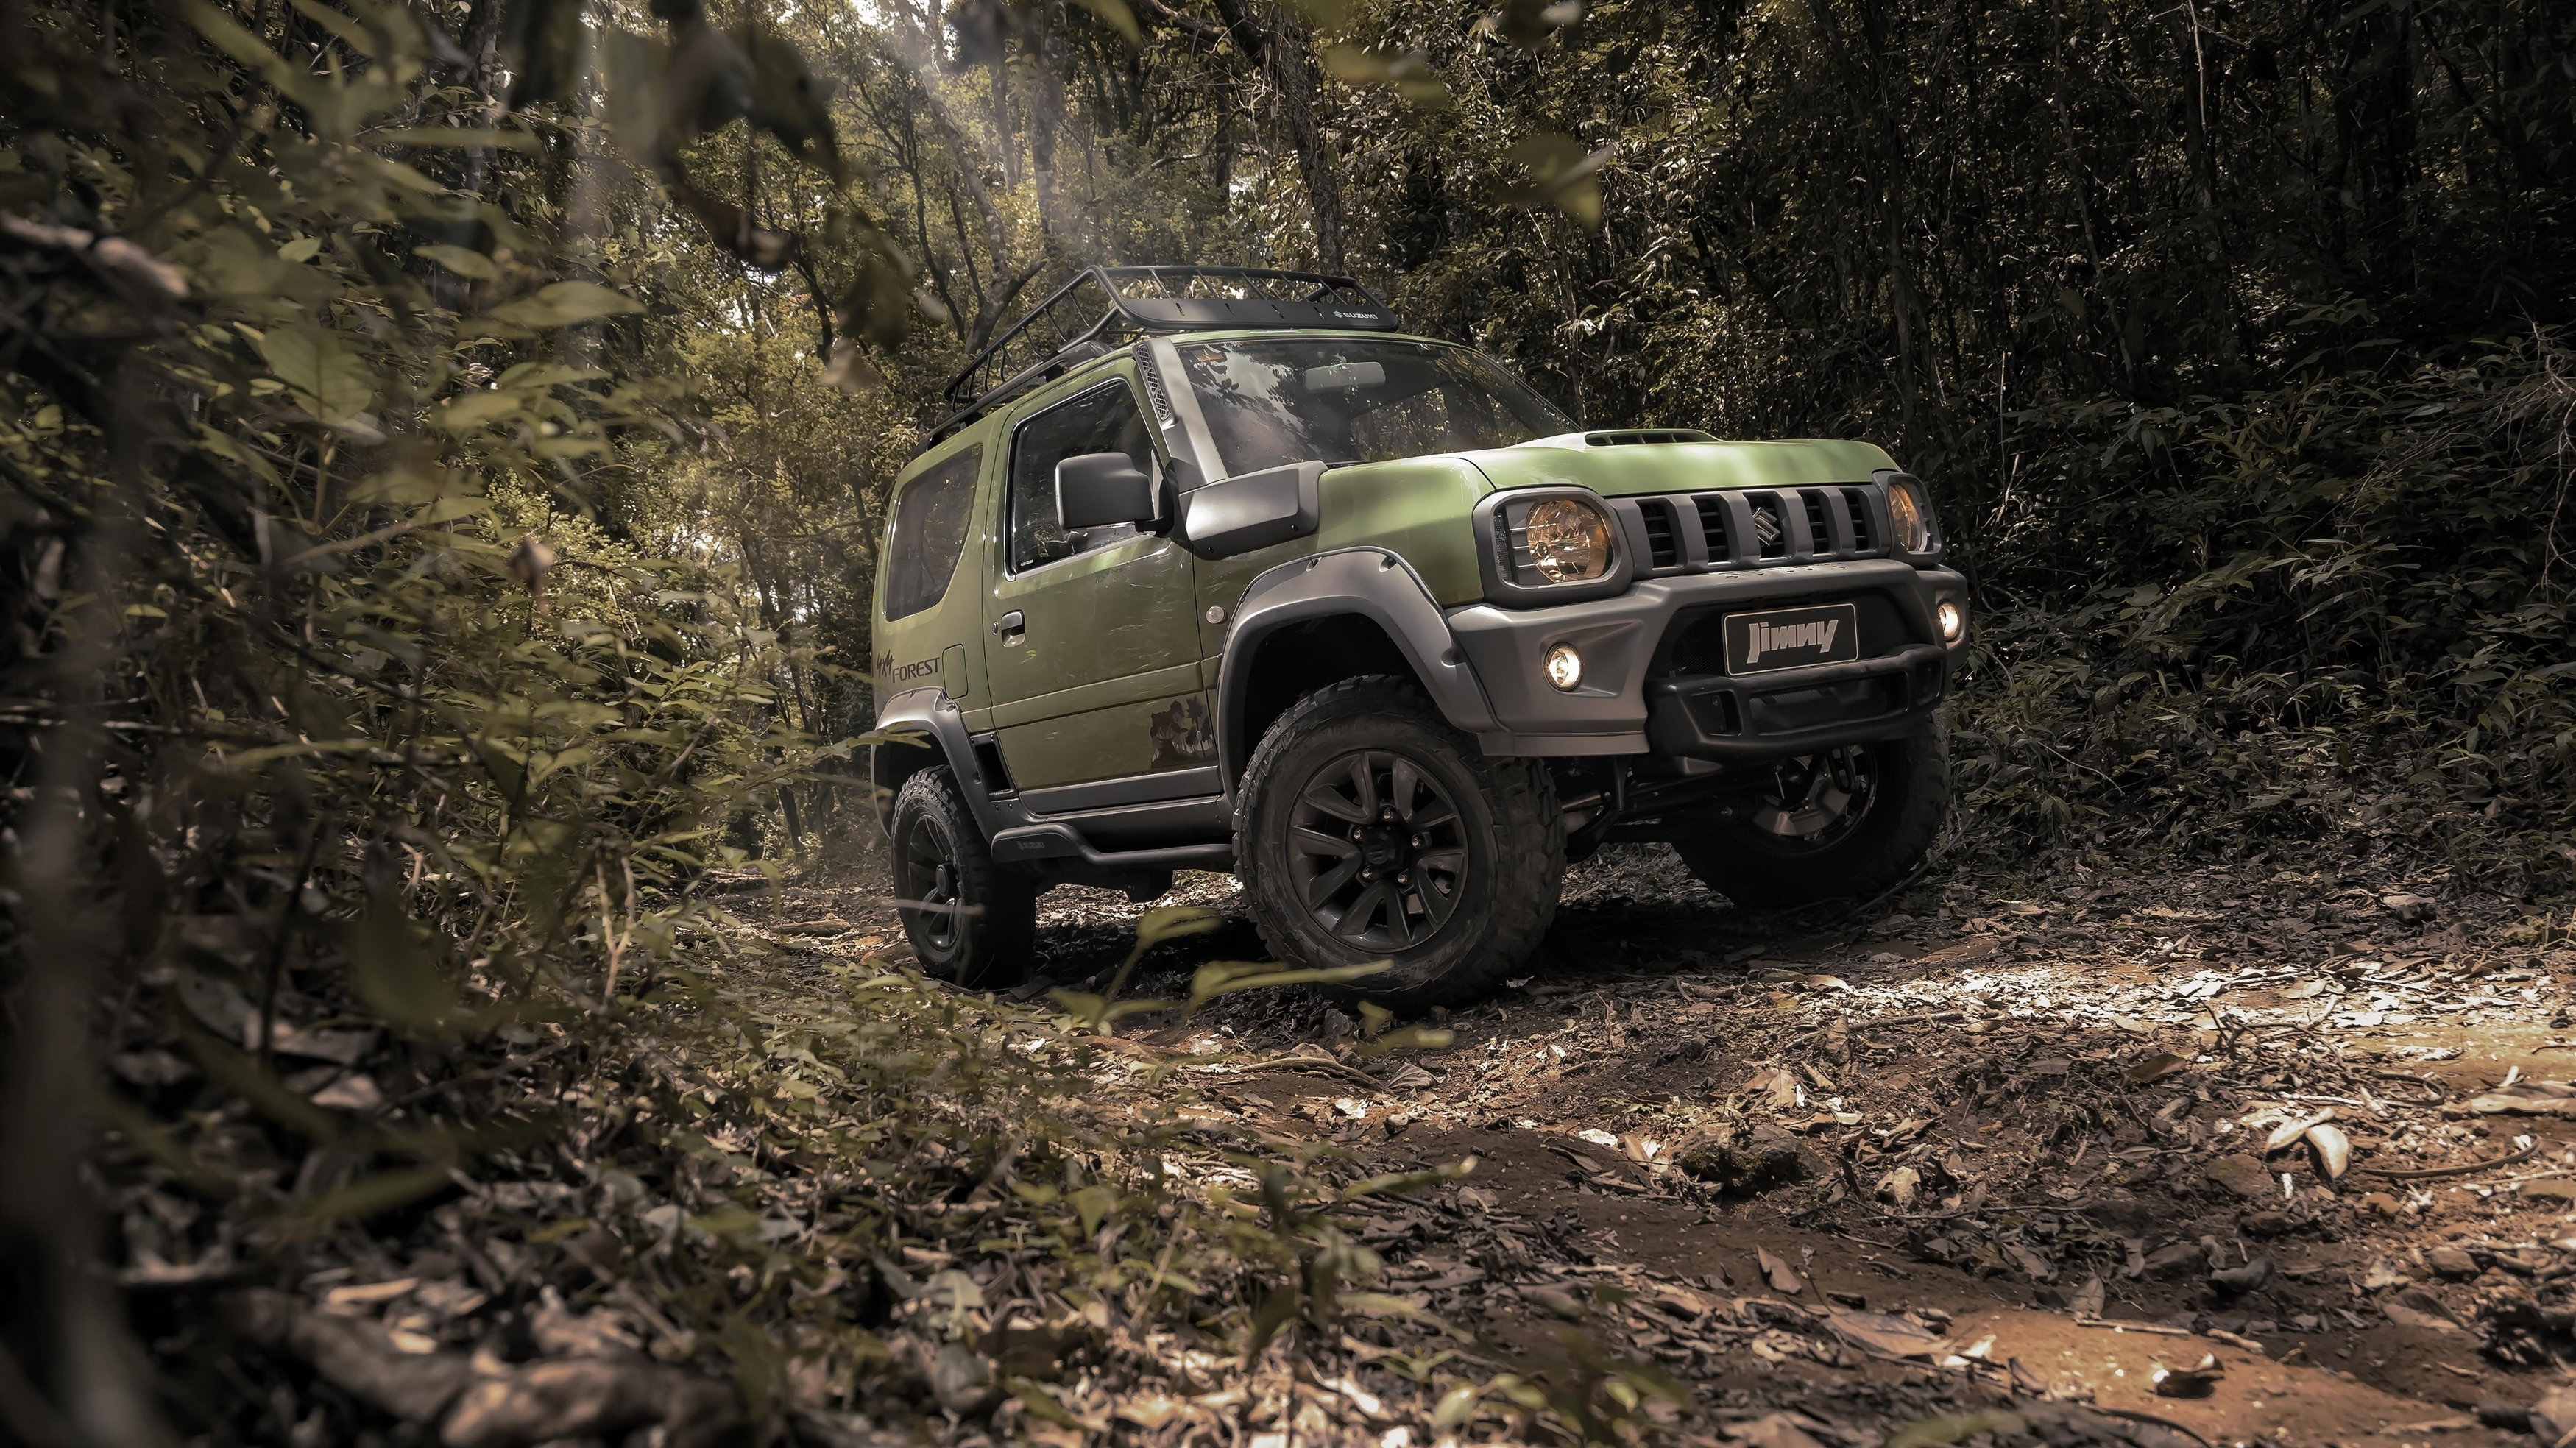 Suzuki jimny forest 2020 обои скачать